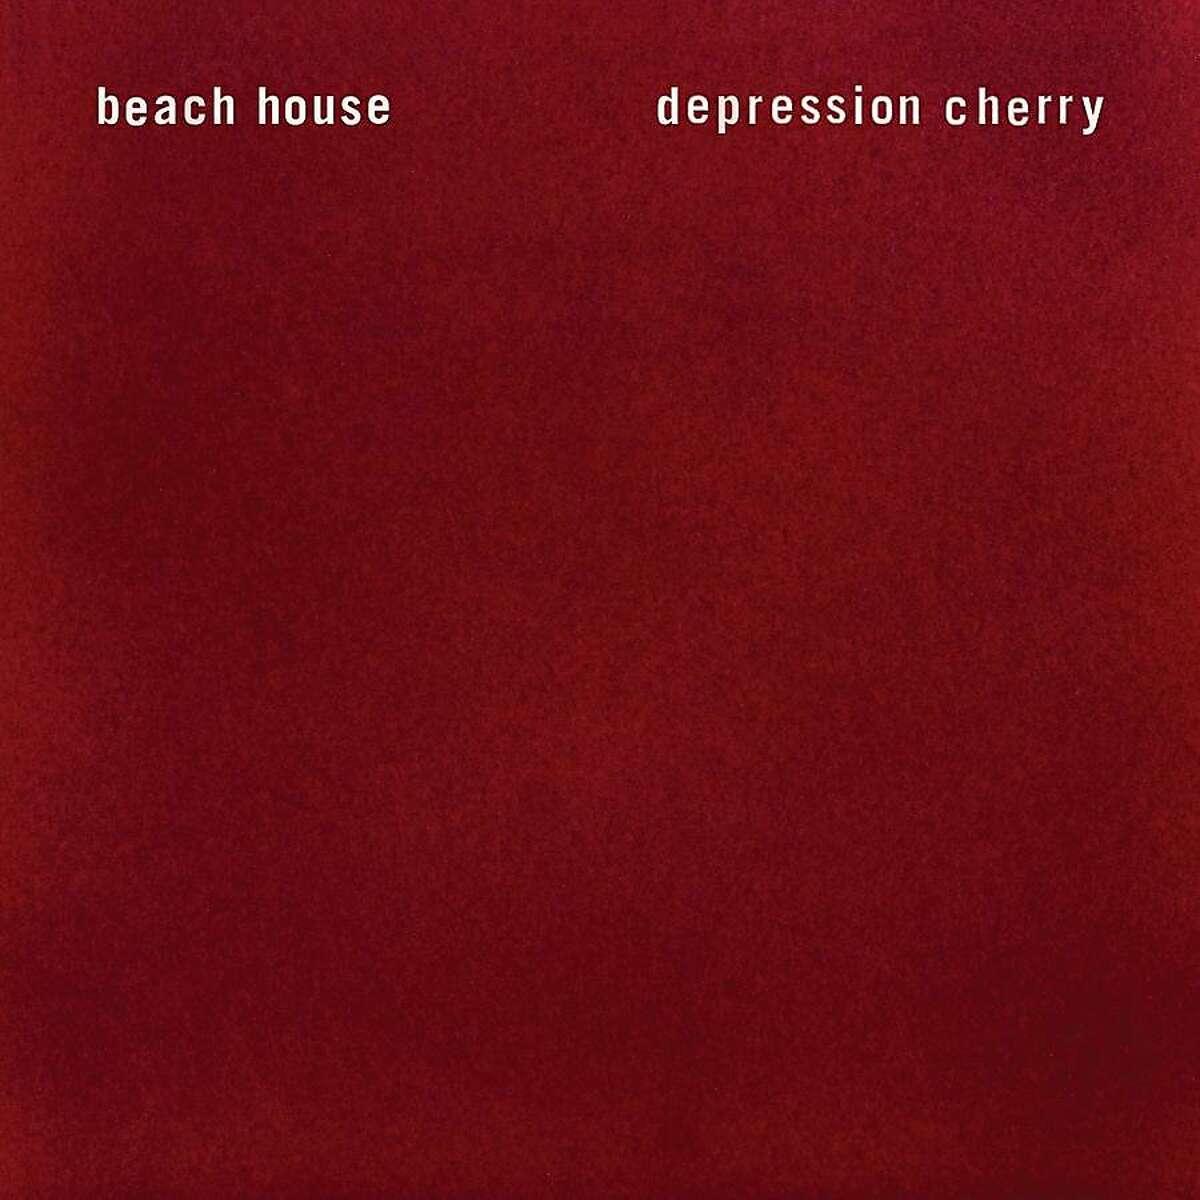 Beach House, 'Depression Cherry'